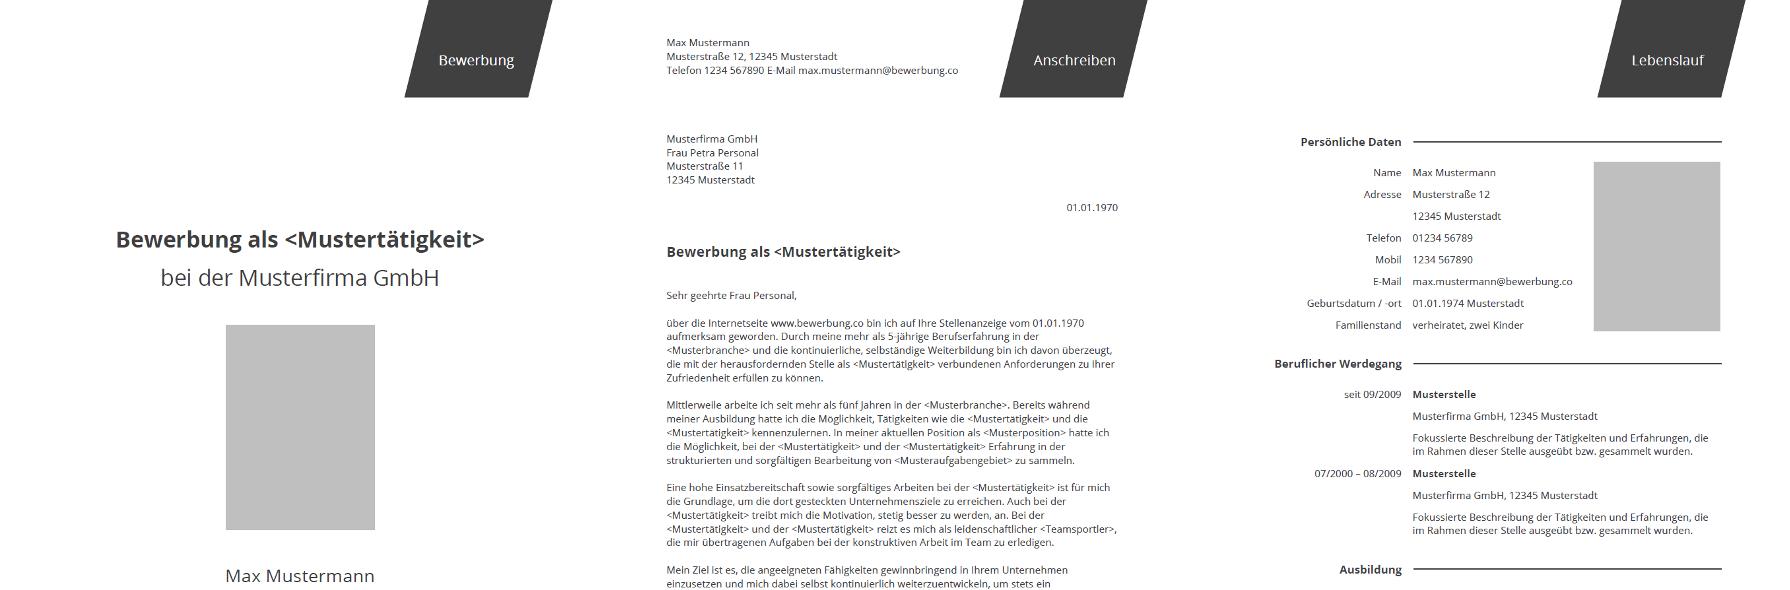 Ehrenamt im Lebenslauf - Bewerbung.co